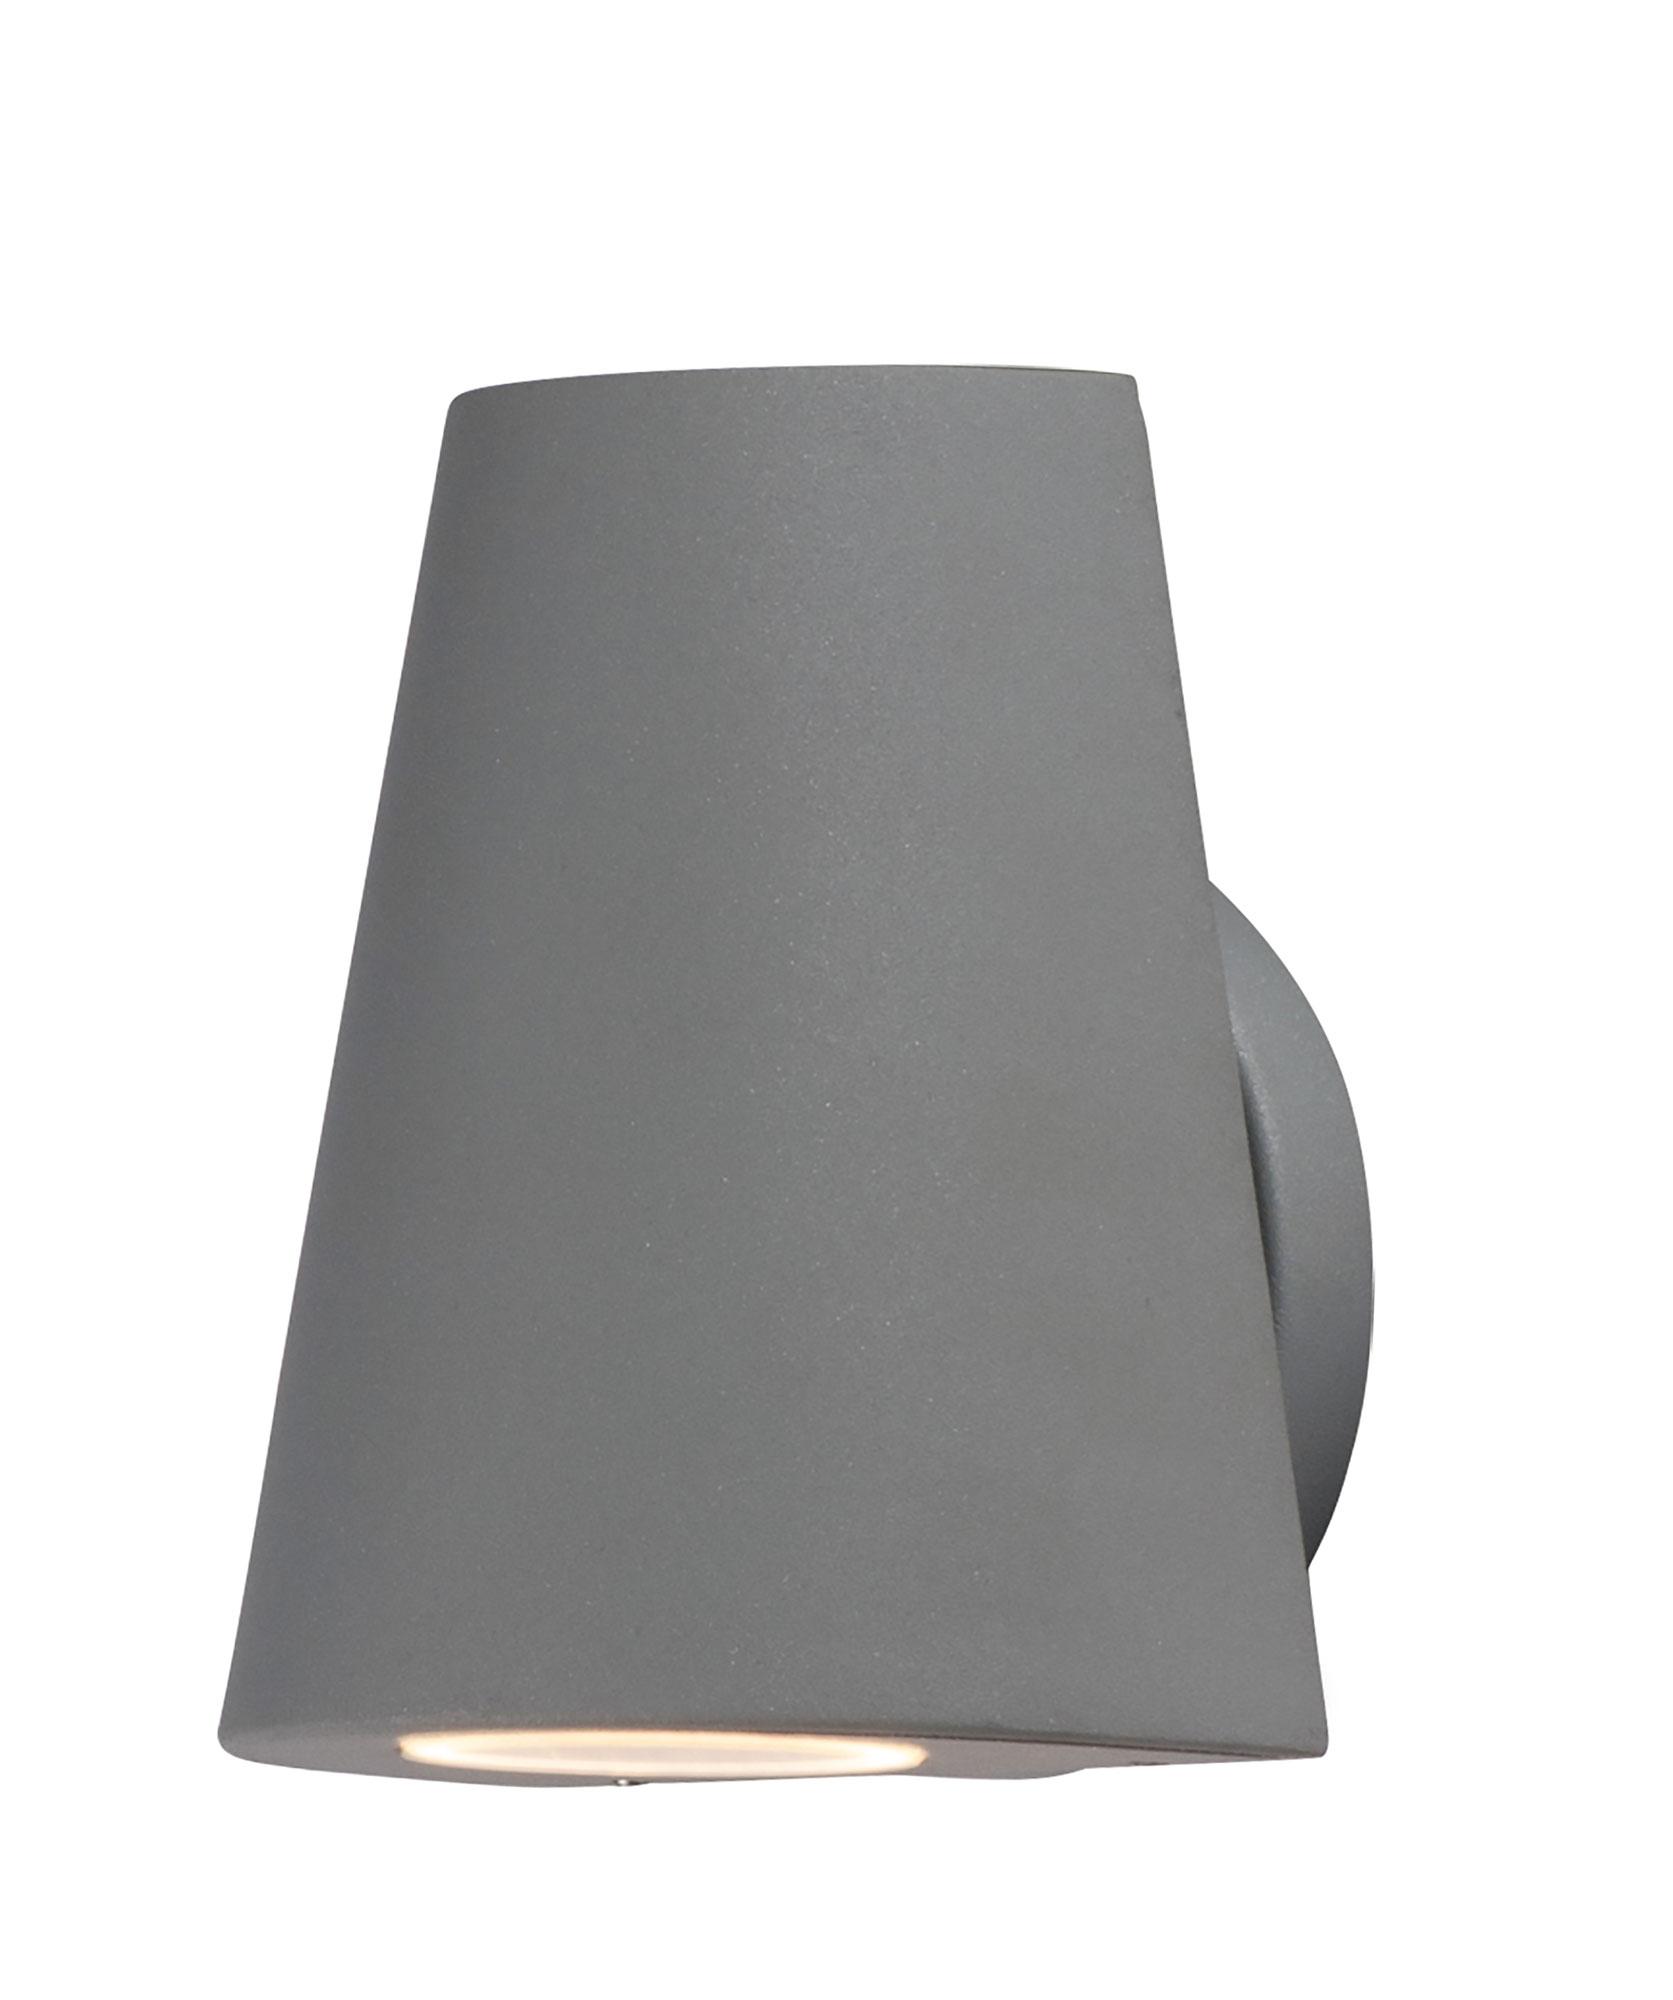 Mini Dark Sky Outdoor Wall Light By Maxim Lighting 86199sv